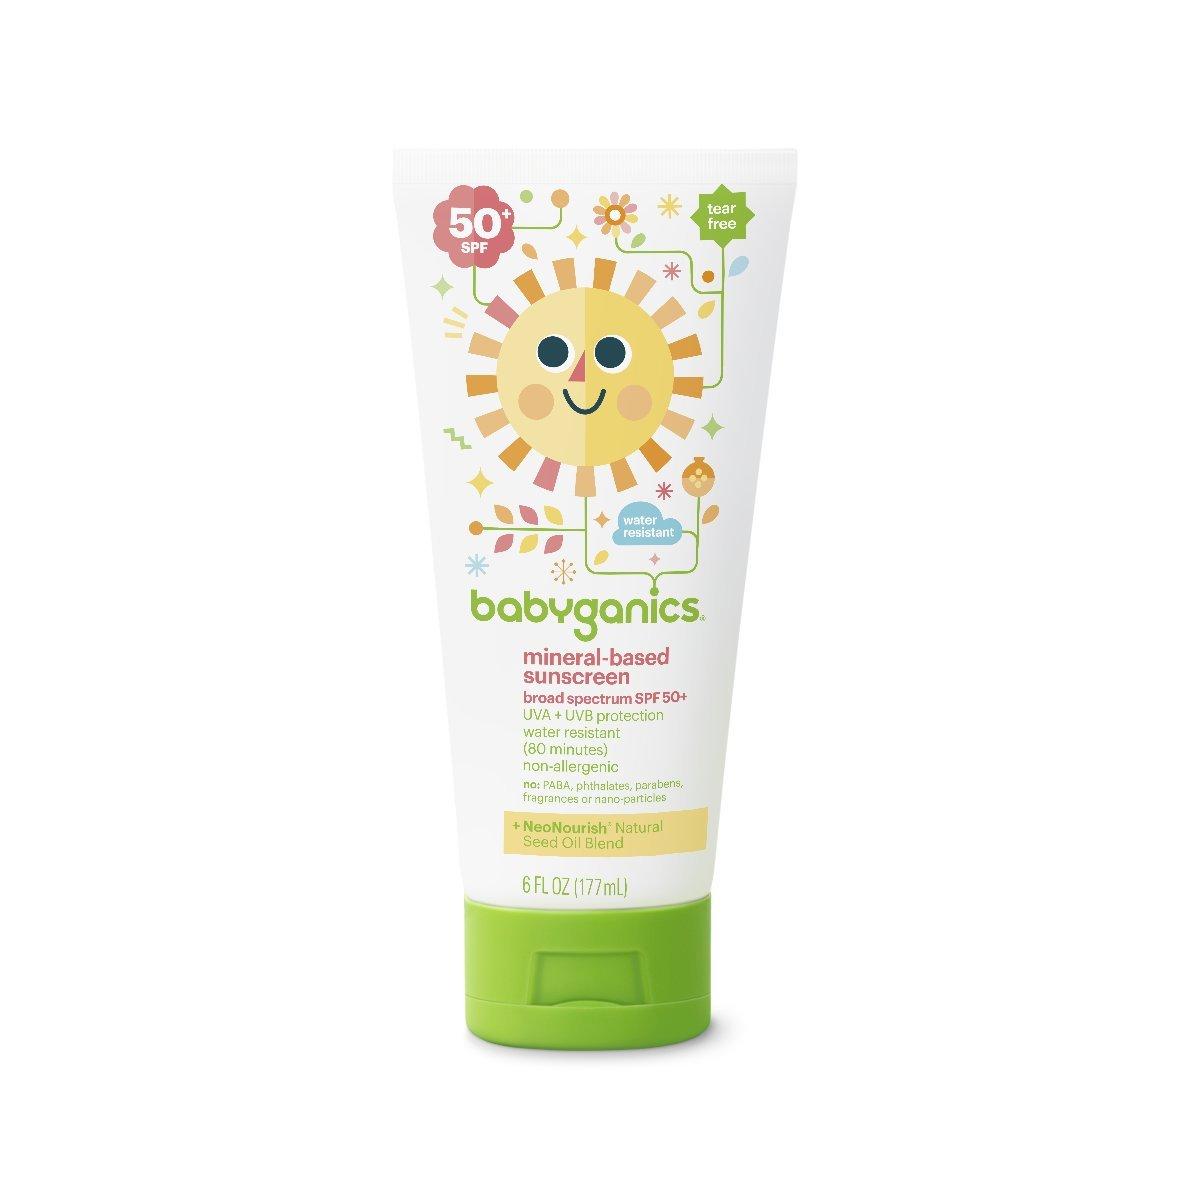 Babyganics Mineral-Based Baby Sunscreen Lotion, SPF 50, 6oz Tube (Pack of 2) Bab-3782 Baby bath products baby bubble bath Baby Ganics